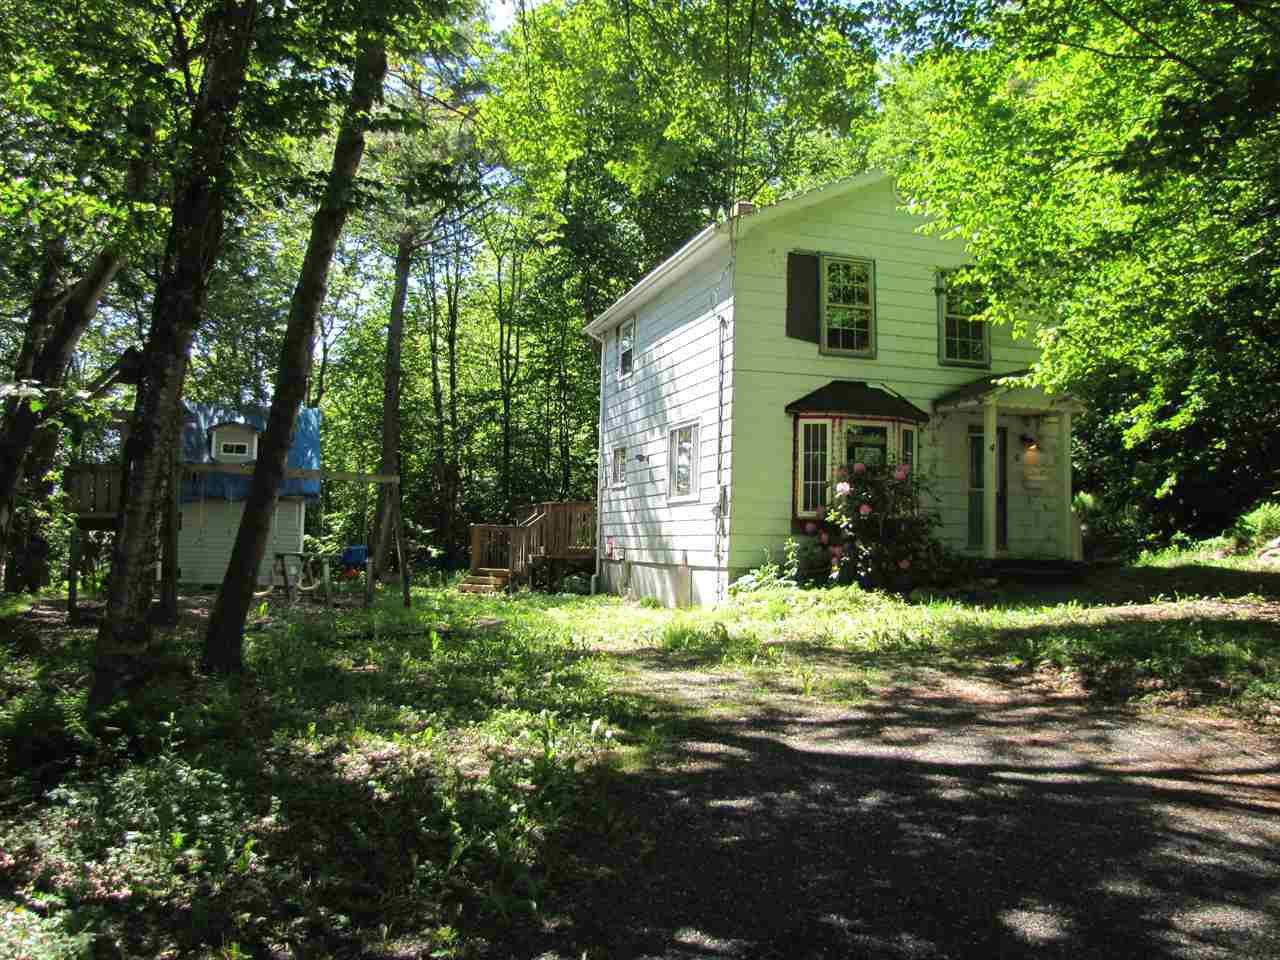 Main Photo: 4 S Roy Street in Halifax: 7-Spryfield Residential for sale (Halifax-Dartmouth)  : MLS®# 201509692